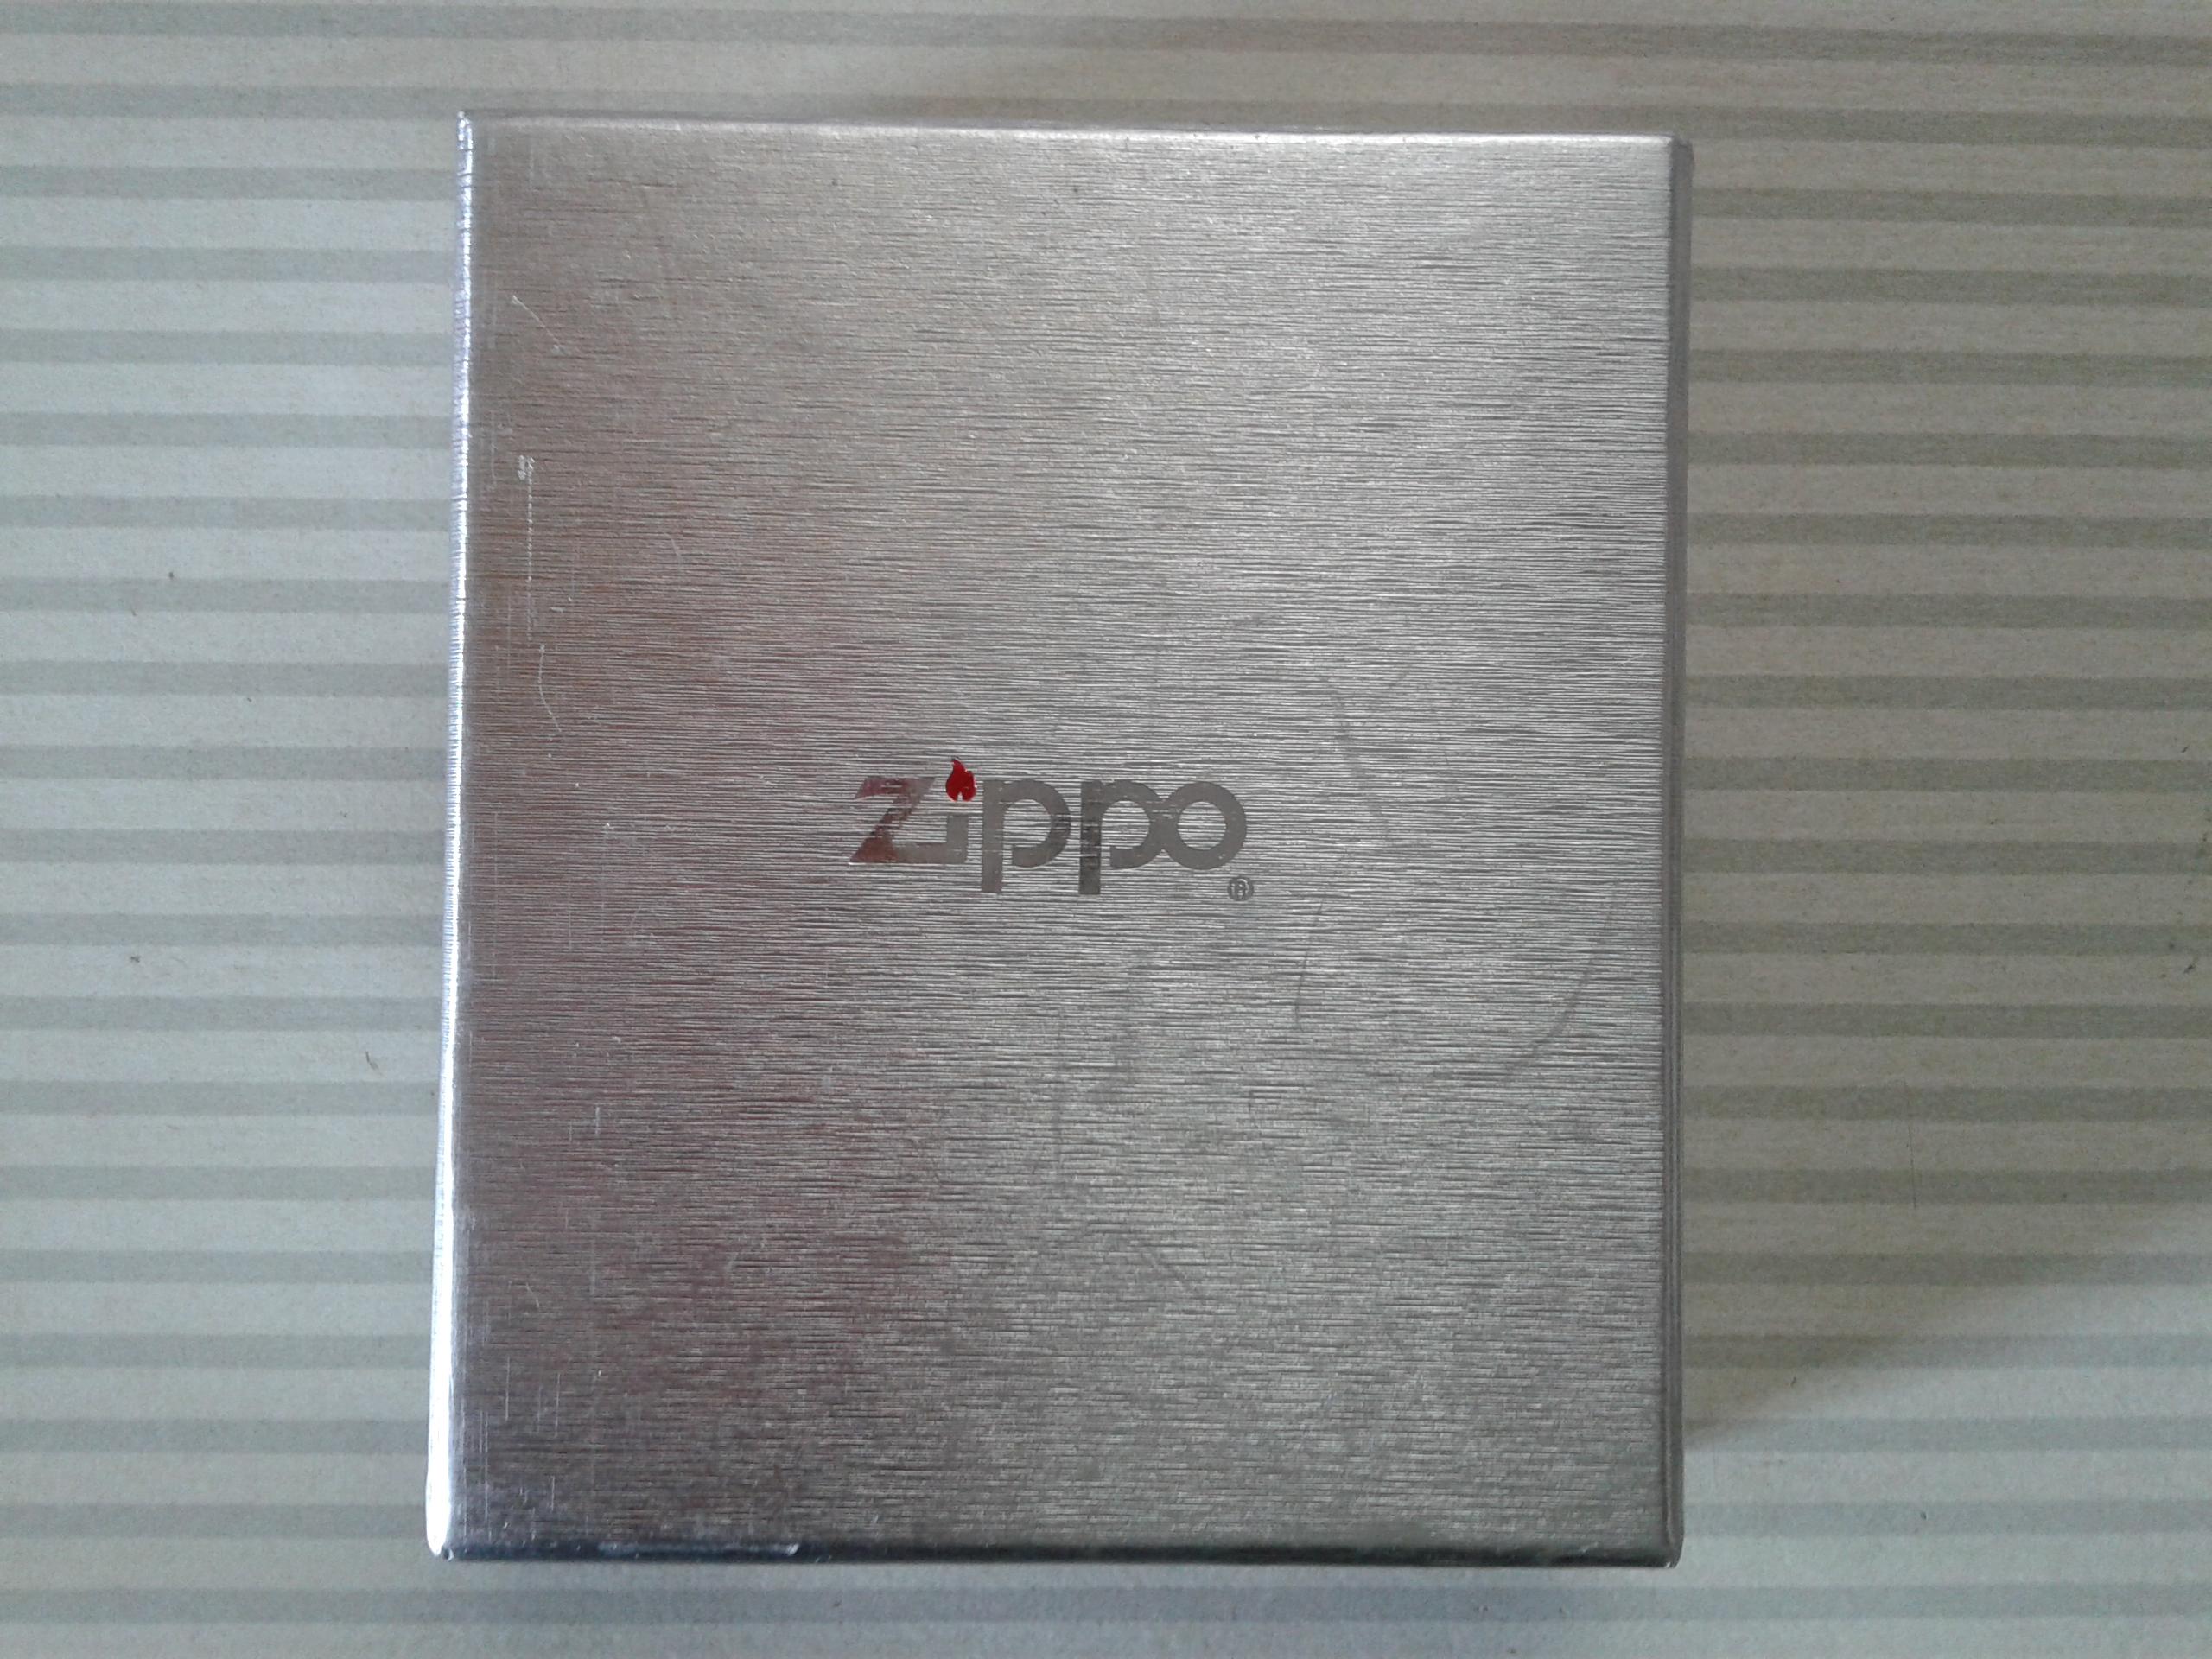 Les boites Zippo au fil du temps - Page 2 877998Silverplate19953